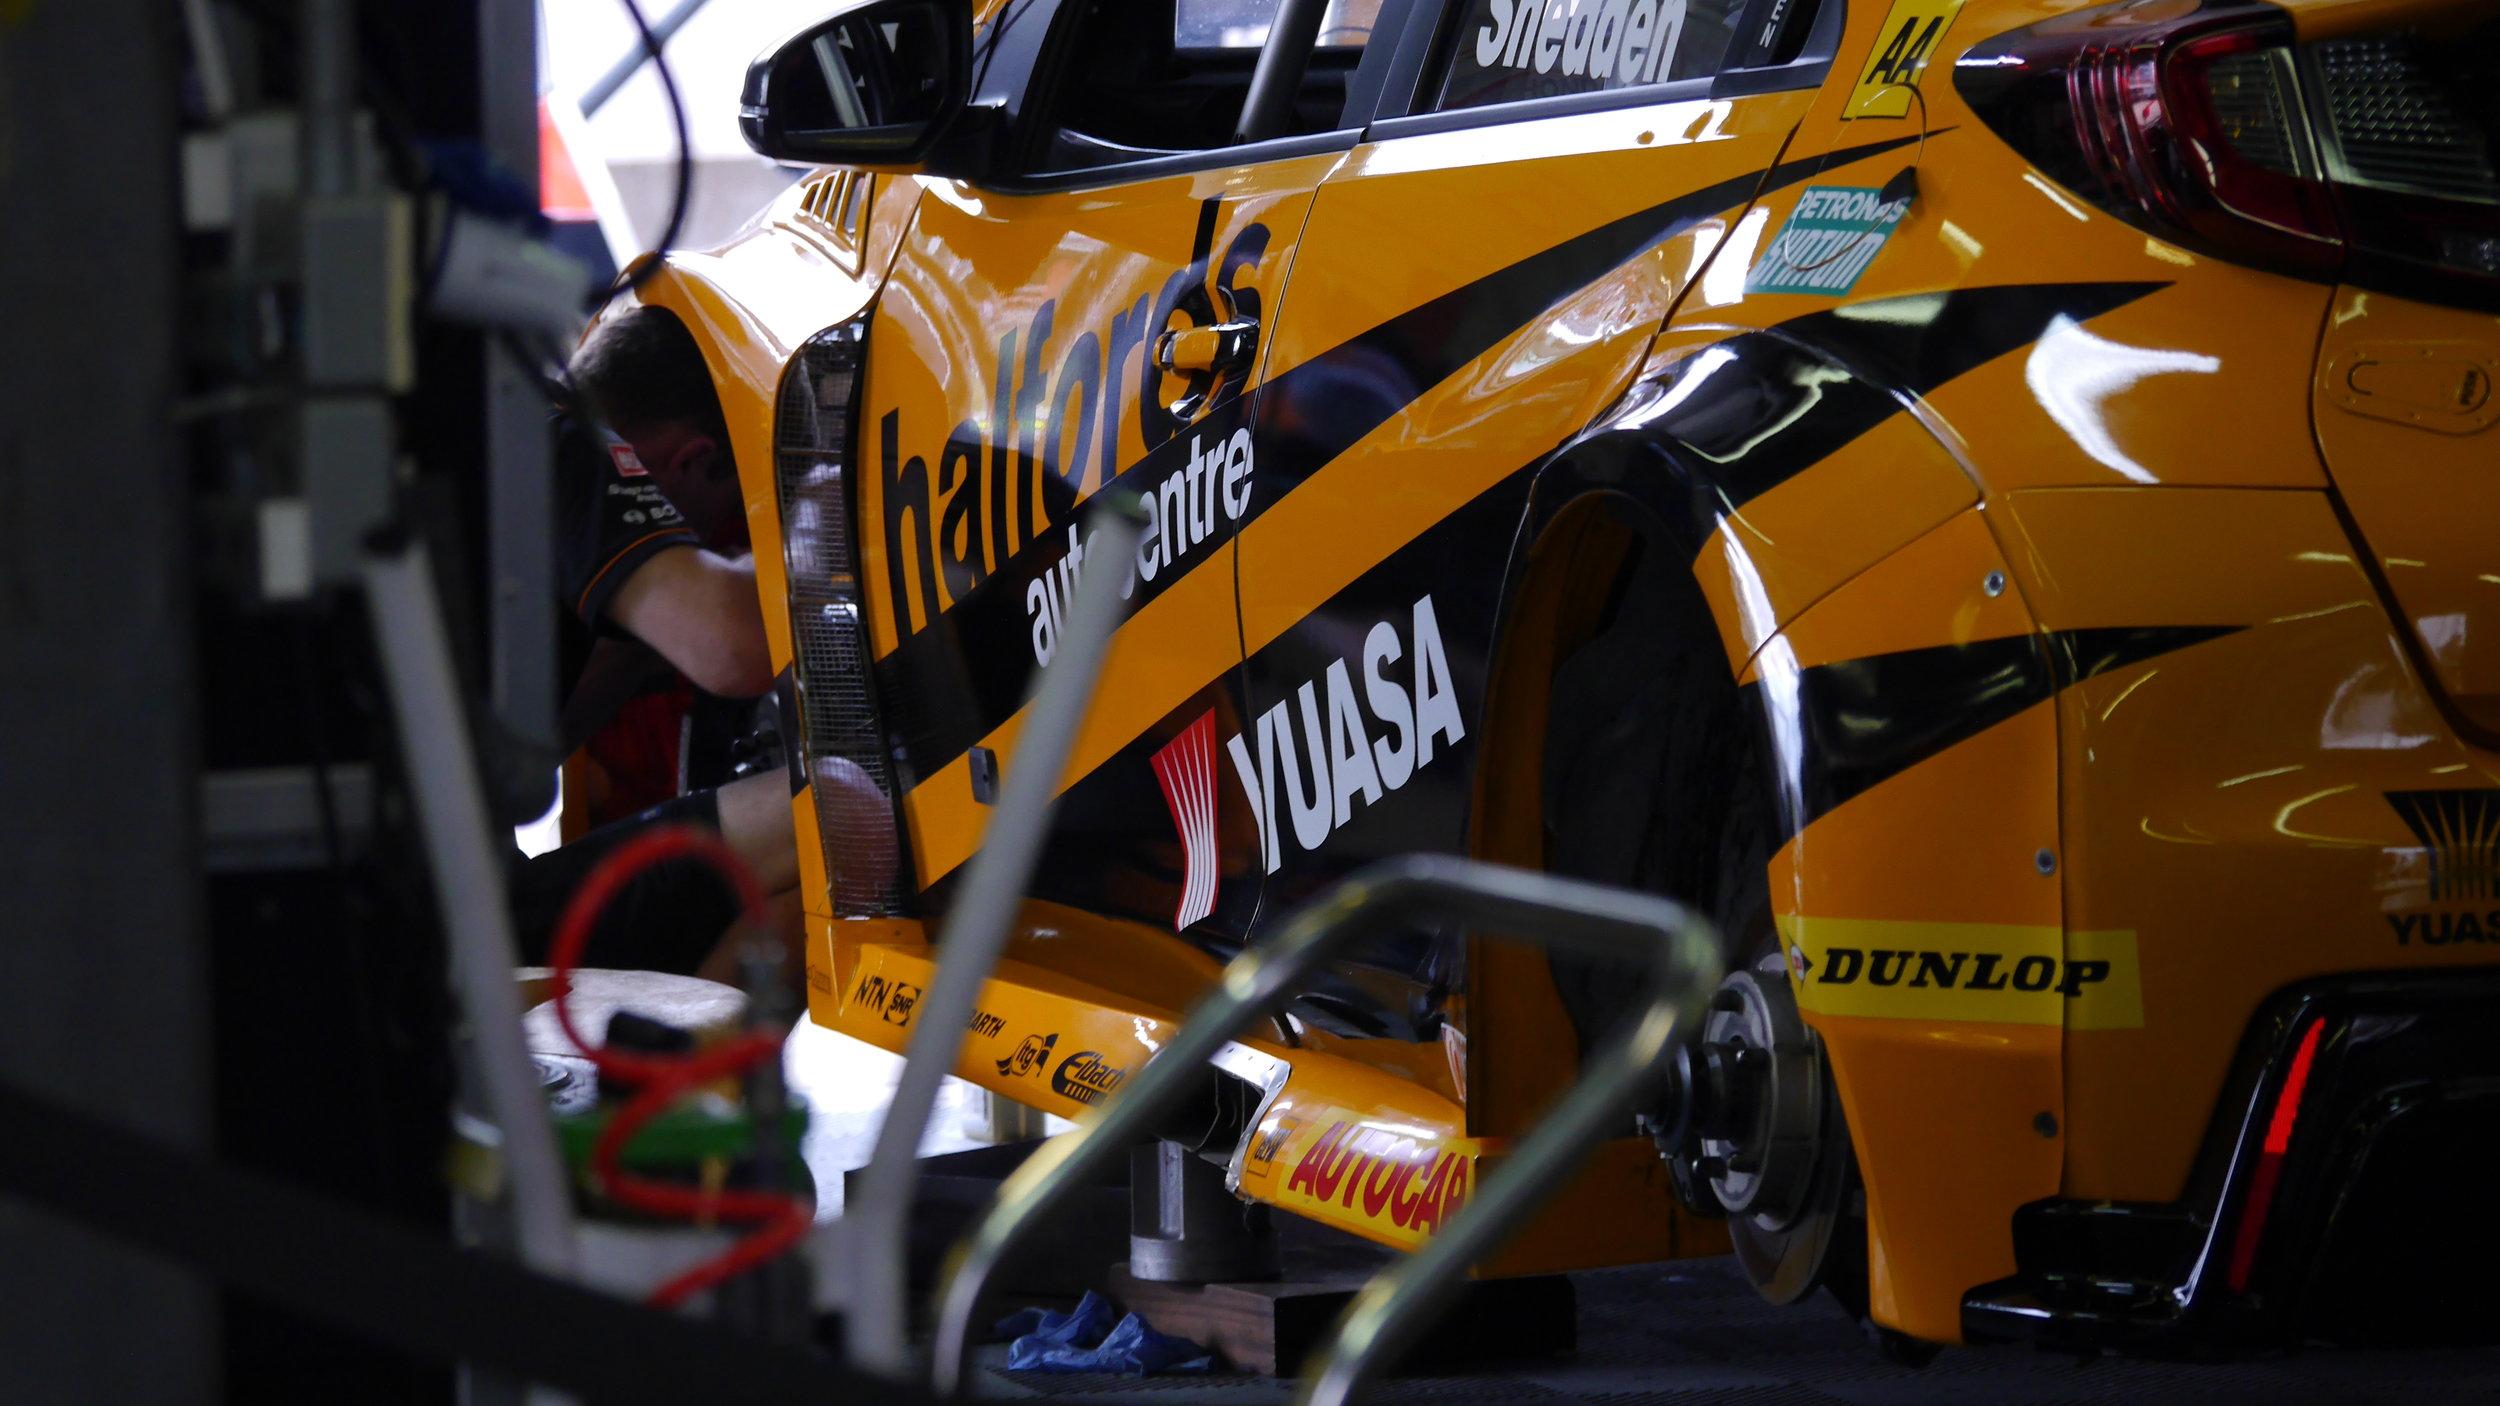 Gordon Shedden's car gets TLC in the garage between races